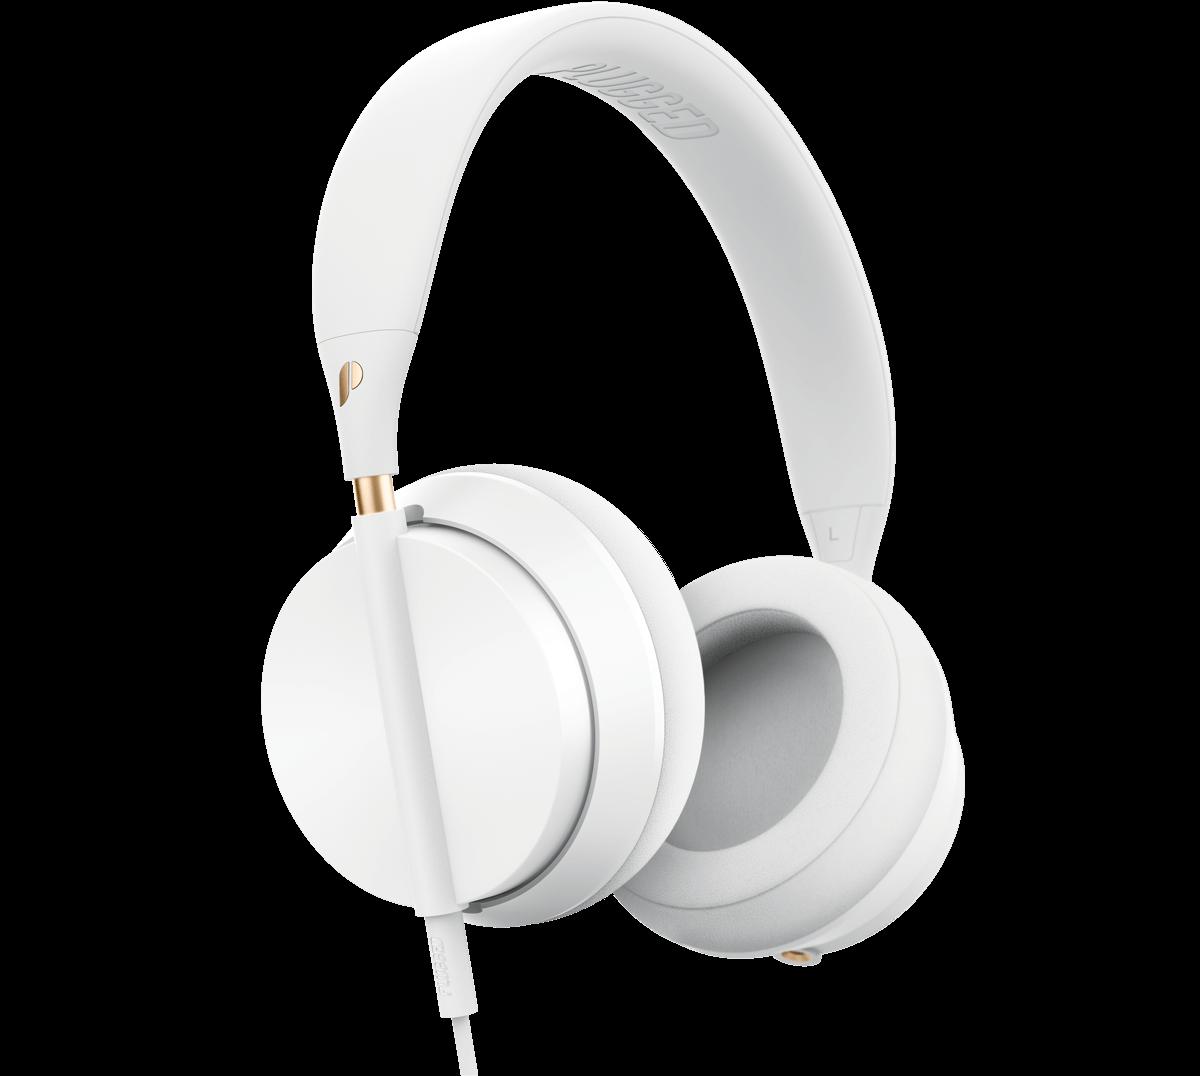 Plugged Headphones